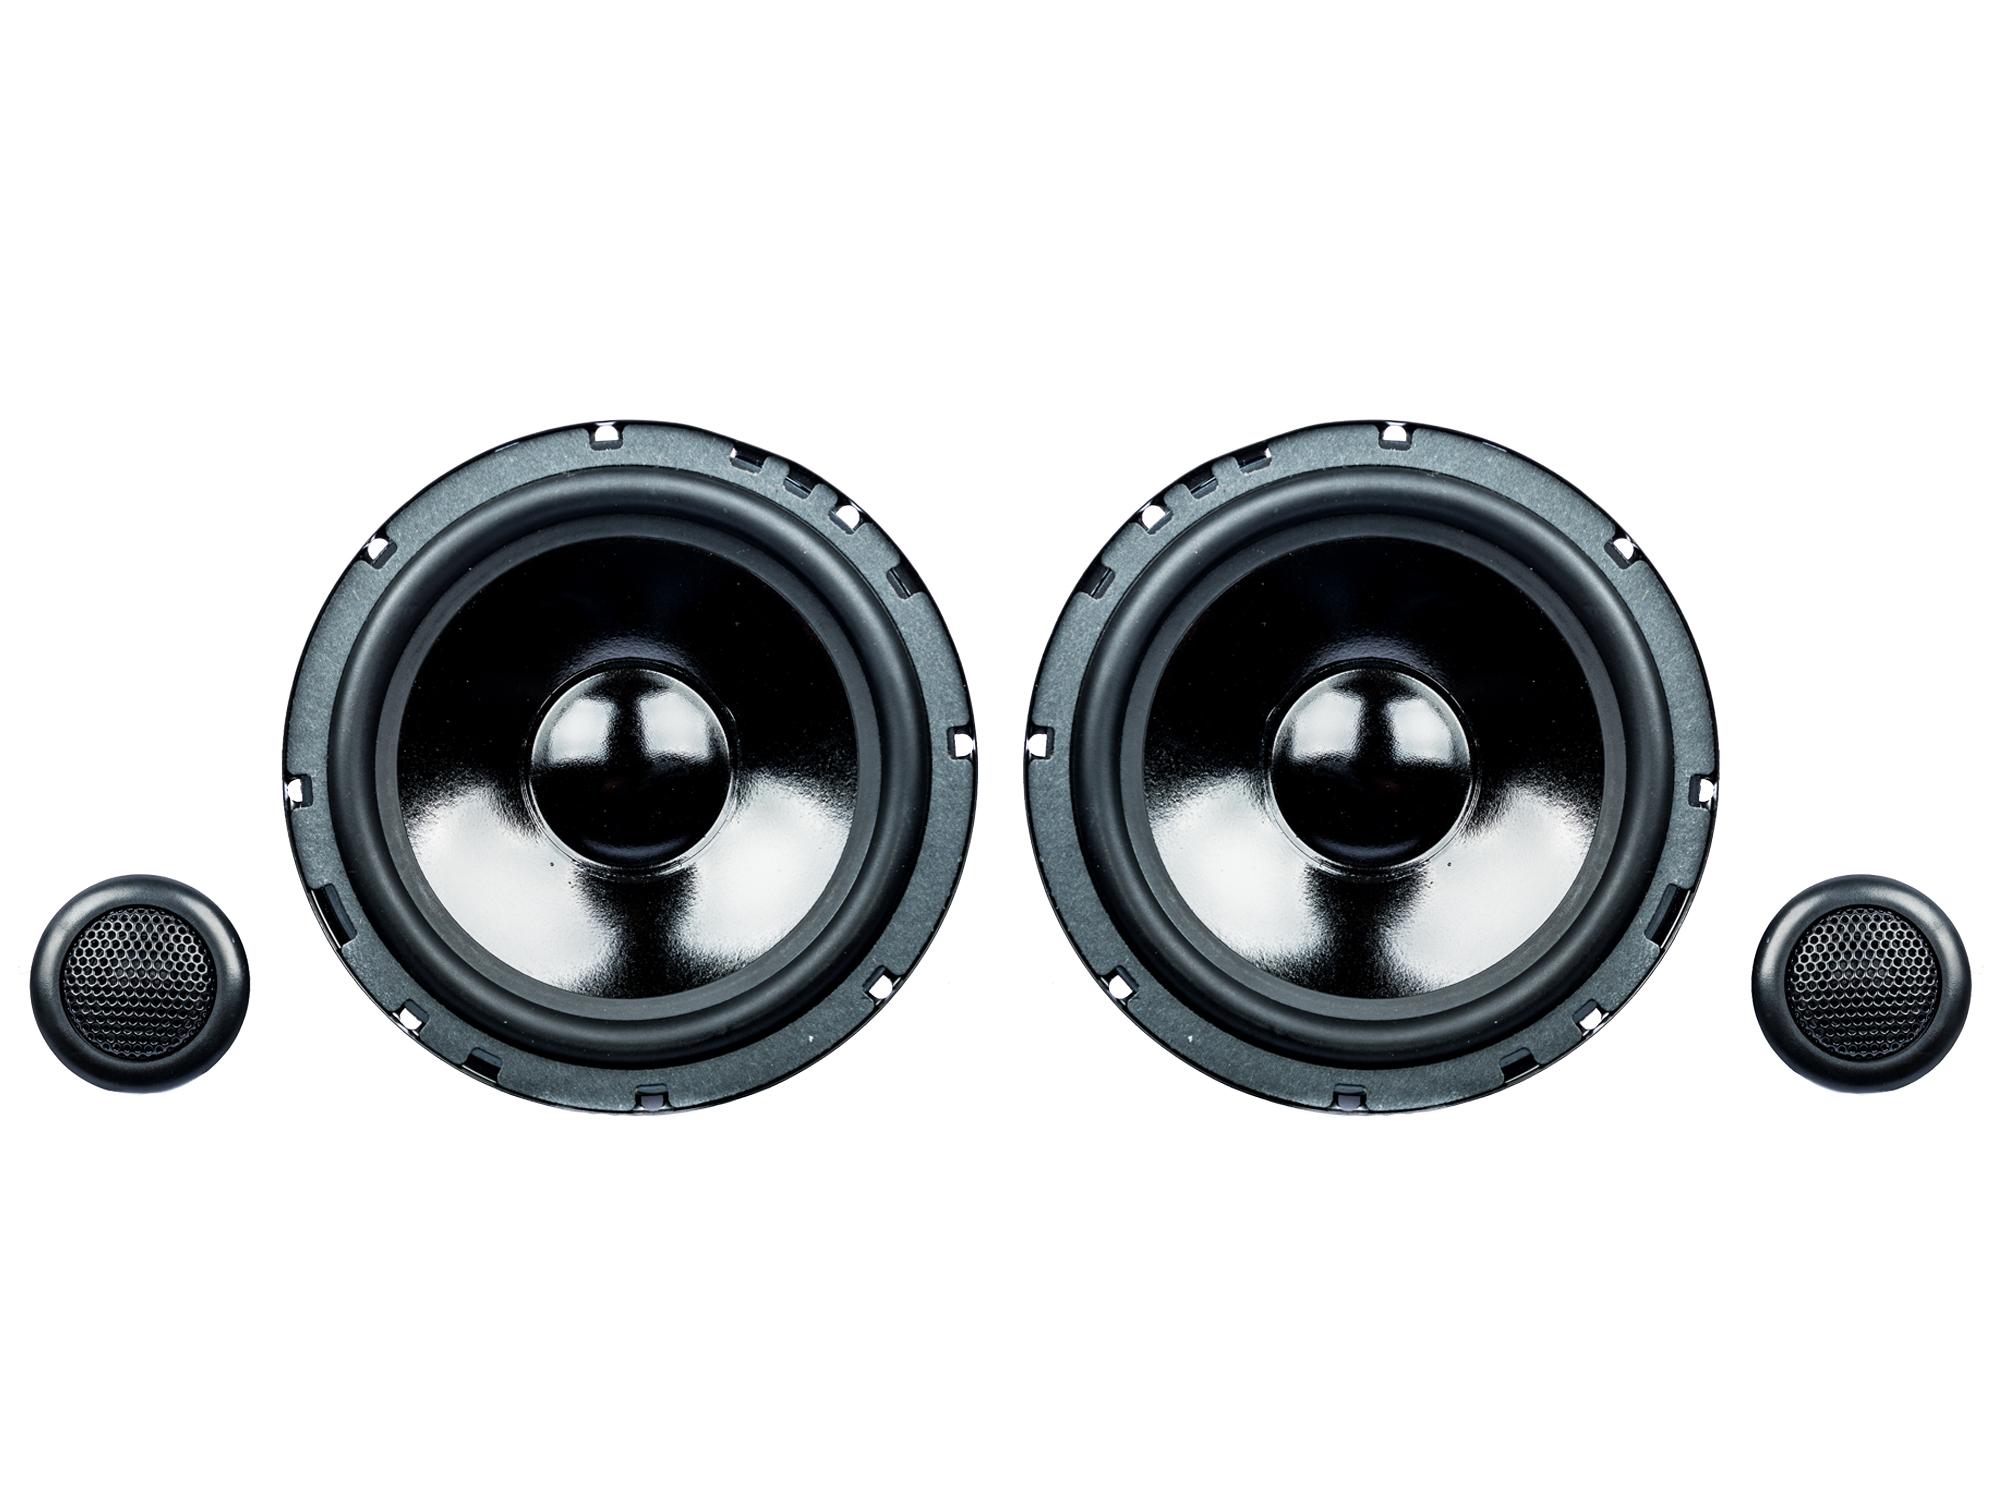 PG Audio 13 cm 2 Wege Kompo Auto Lautsprecher 2.13 Neu 120 Watt – Bild 1